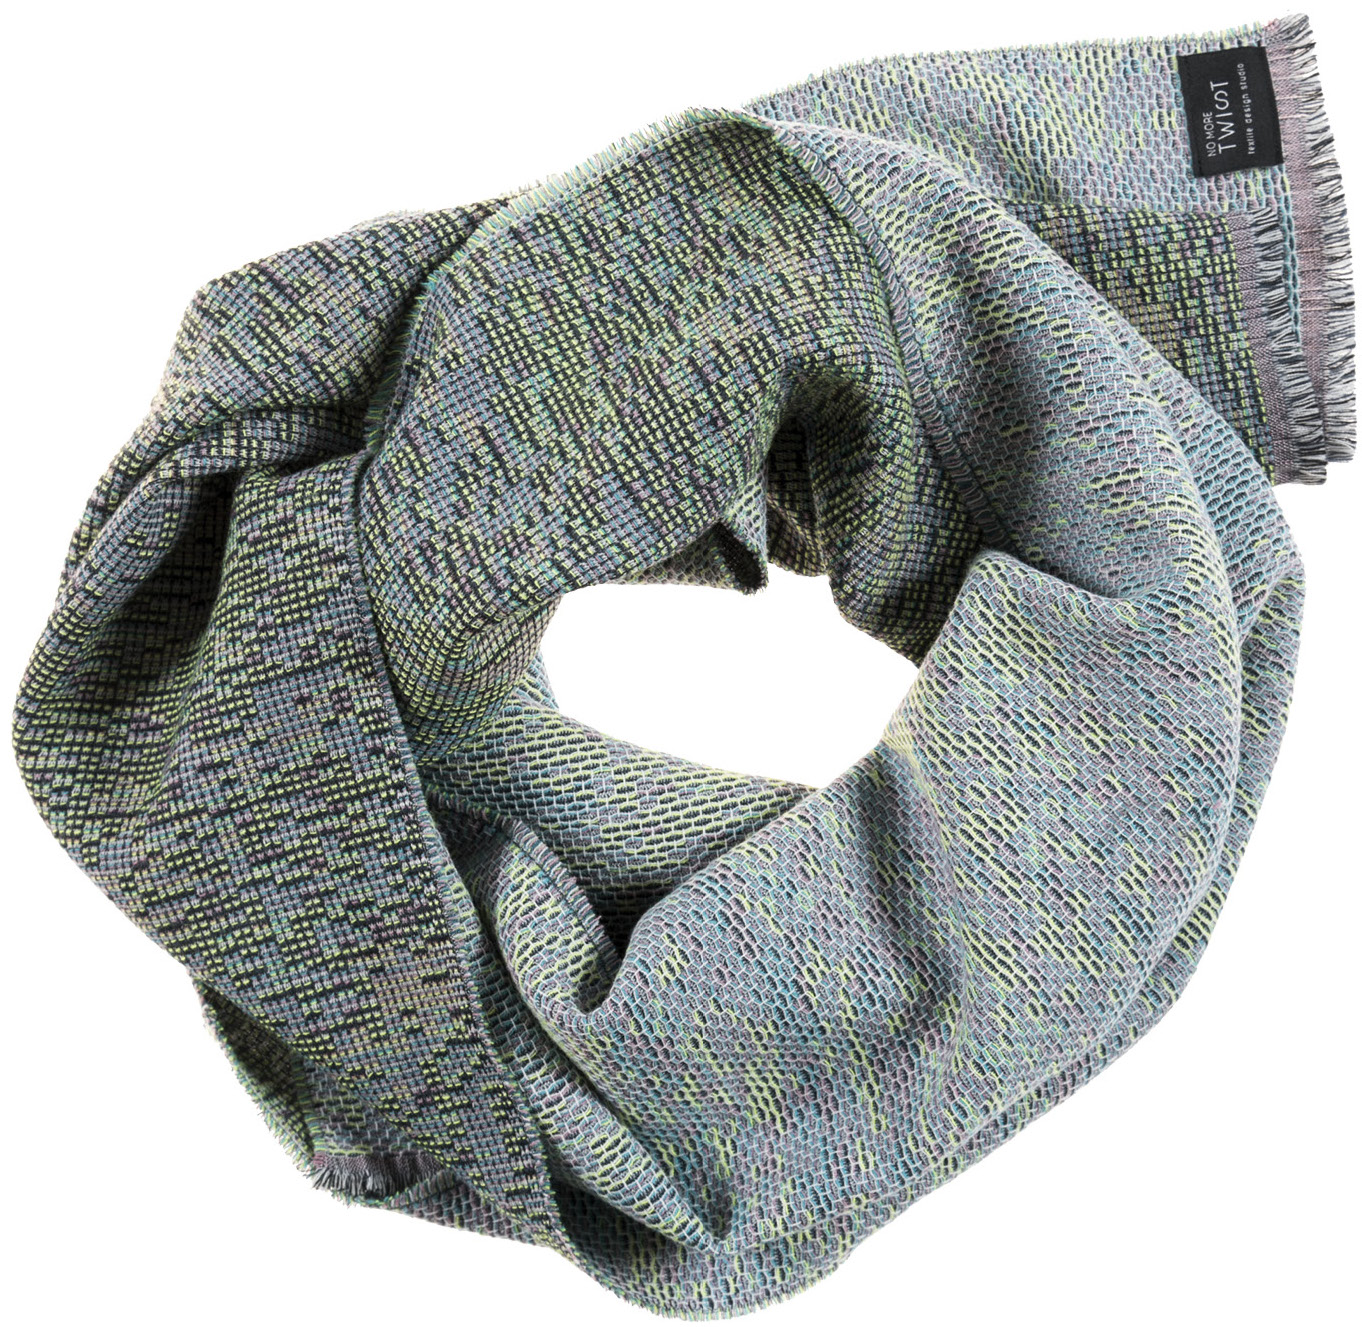 Reflet/ blue - scarf / étole ≅ 45 x 181 cm  Composition: jacquard woven fabric 78% wool 16% viscose 6% silk